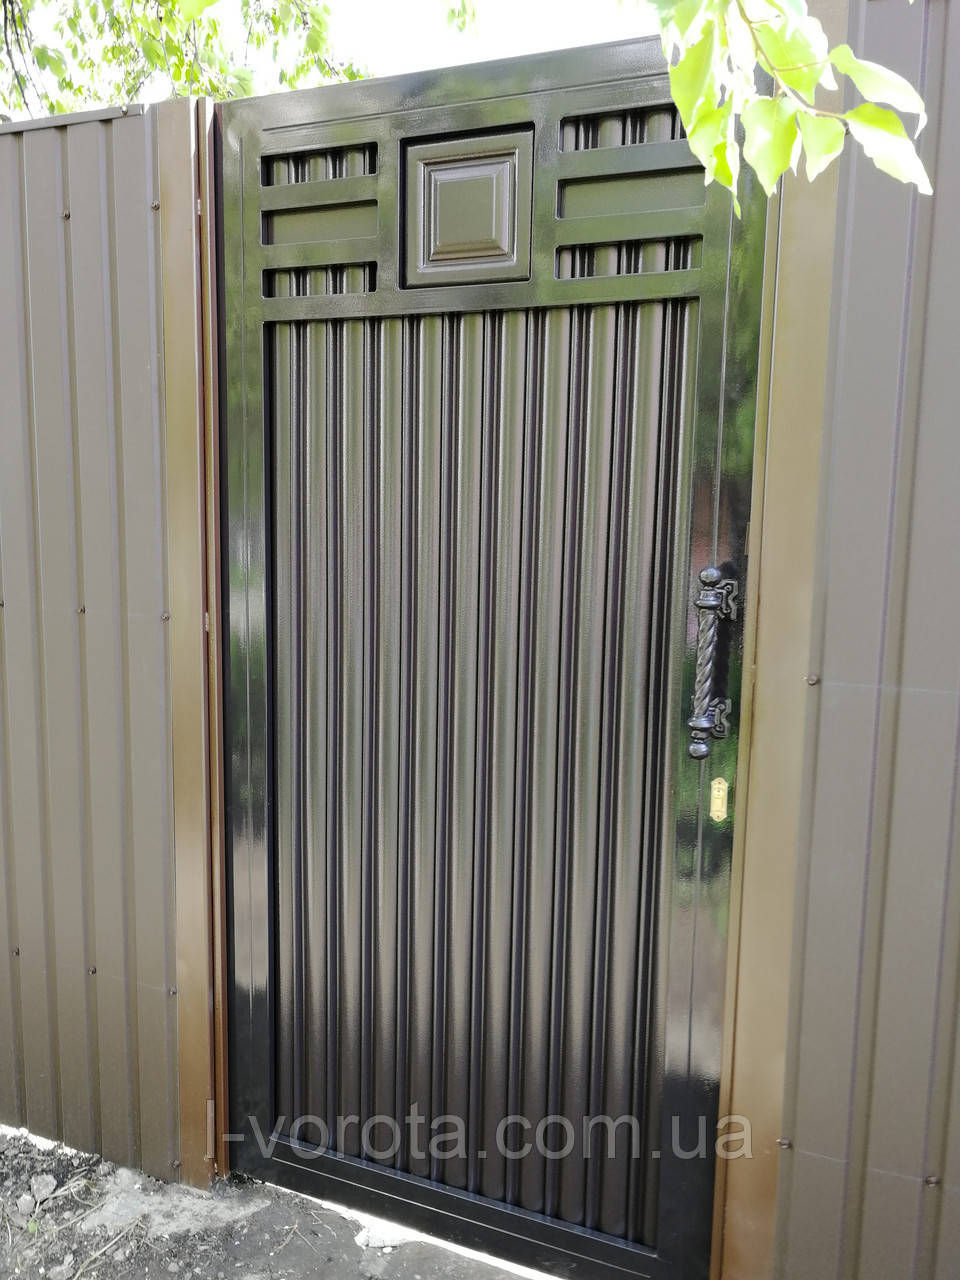 Калитка ТМ Хардвик 1000×2100 (дизайн ЛЮКС)